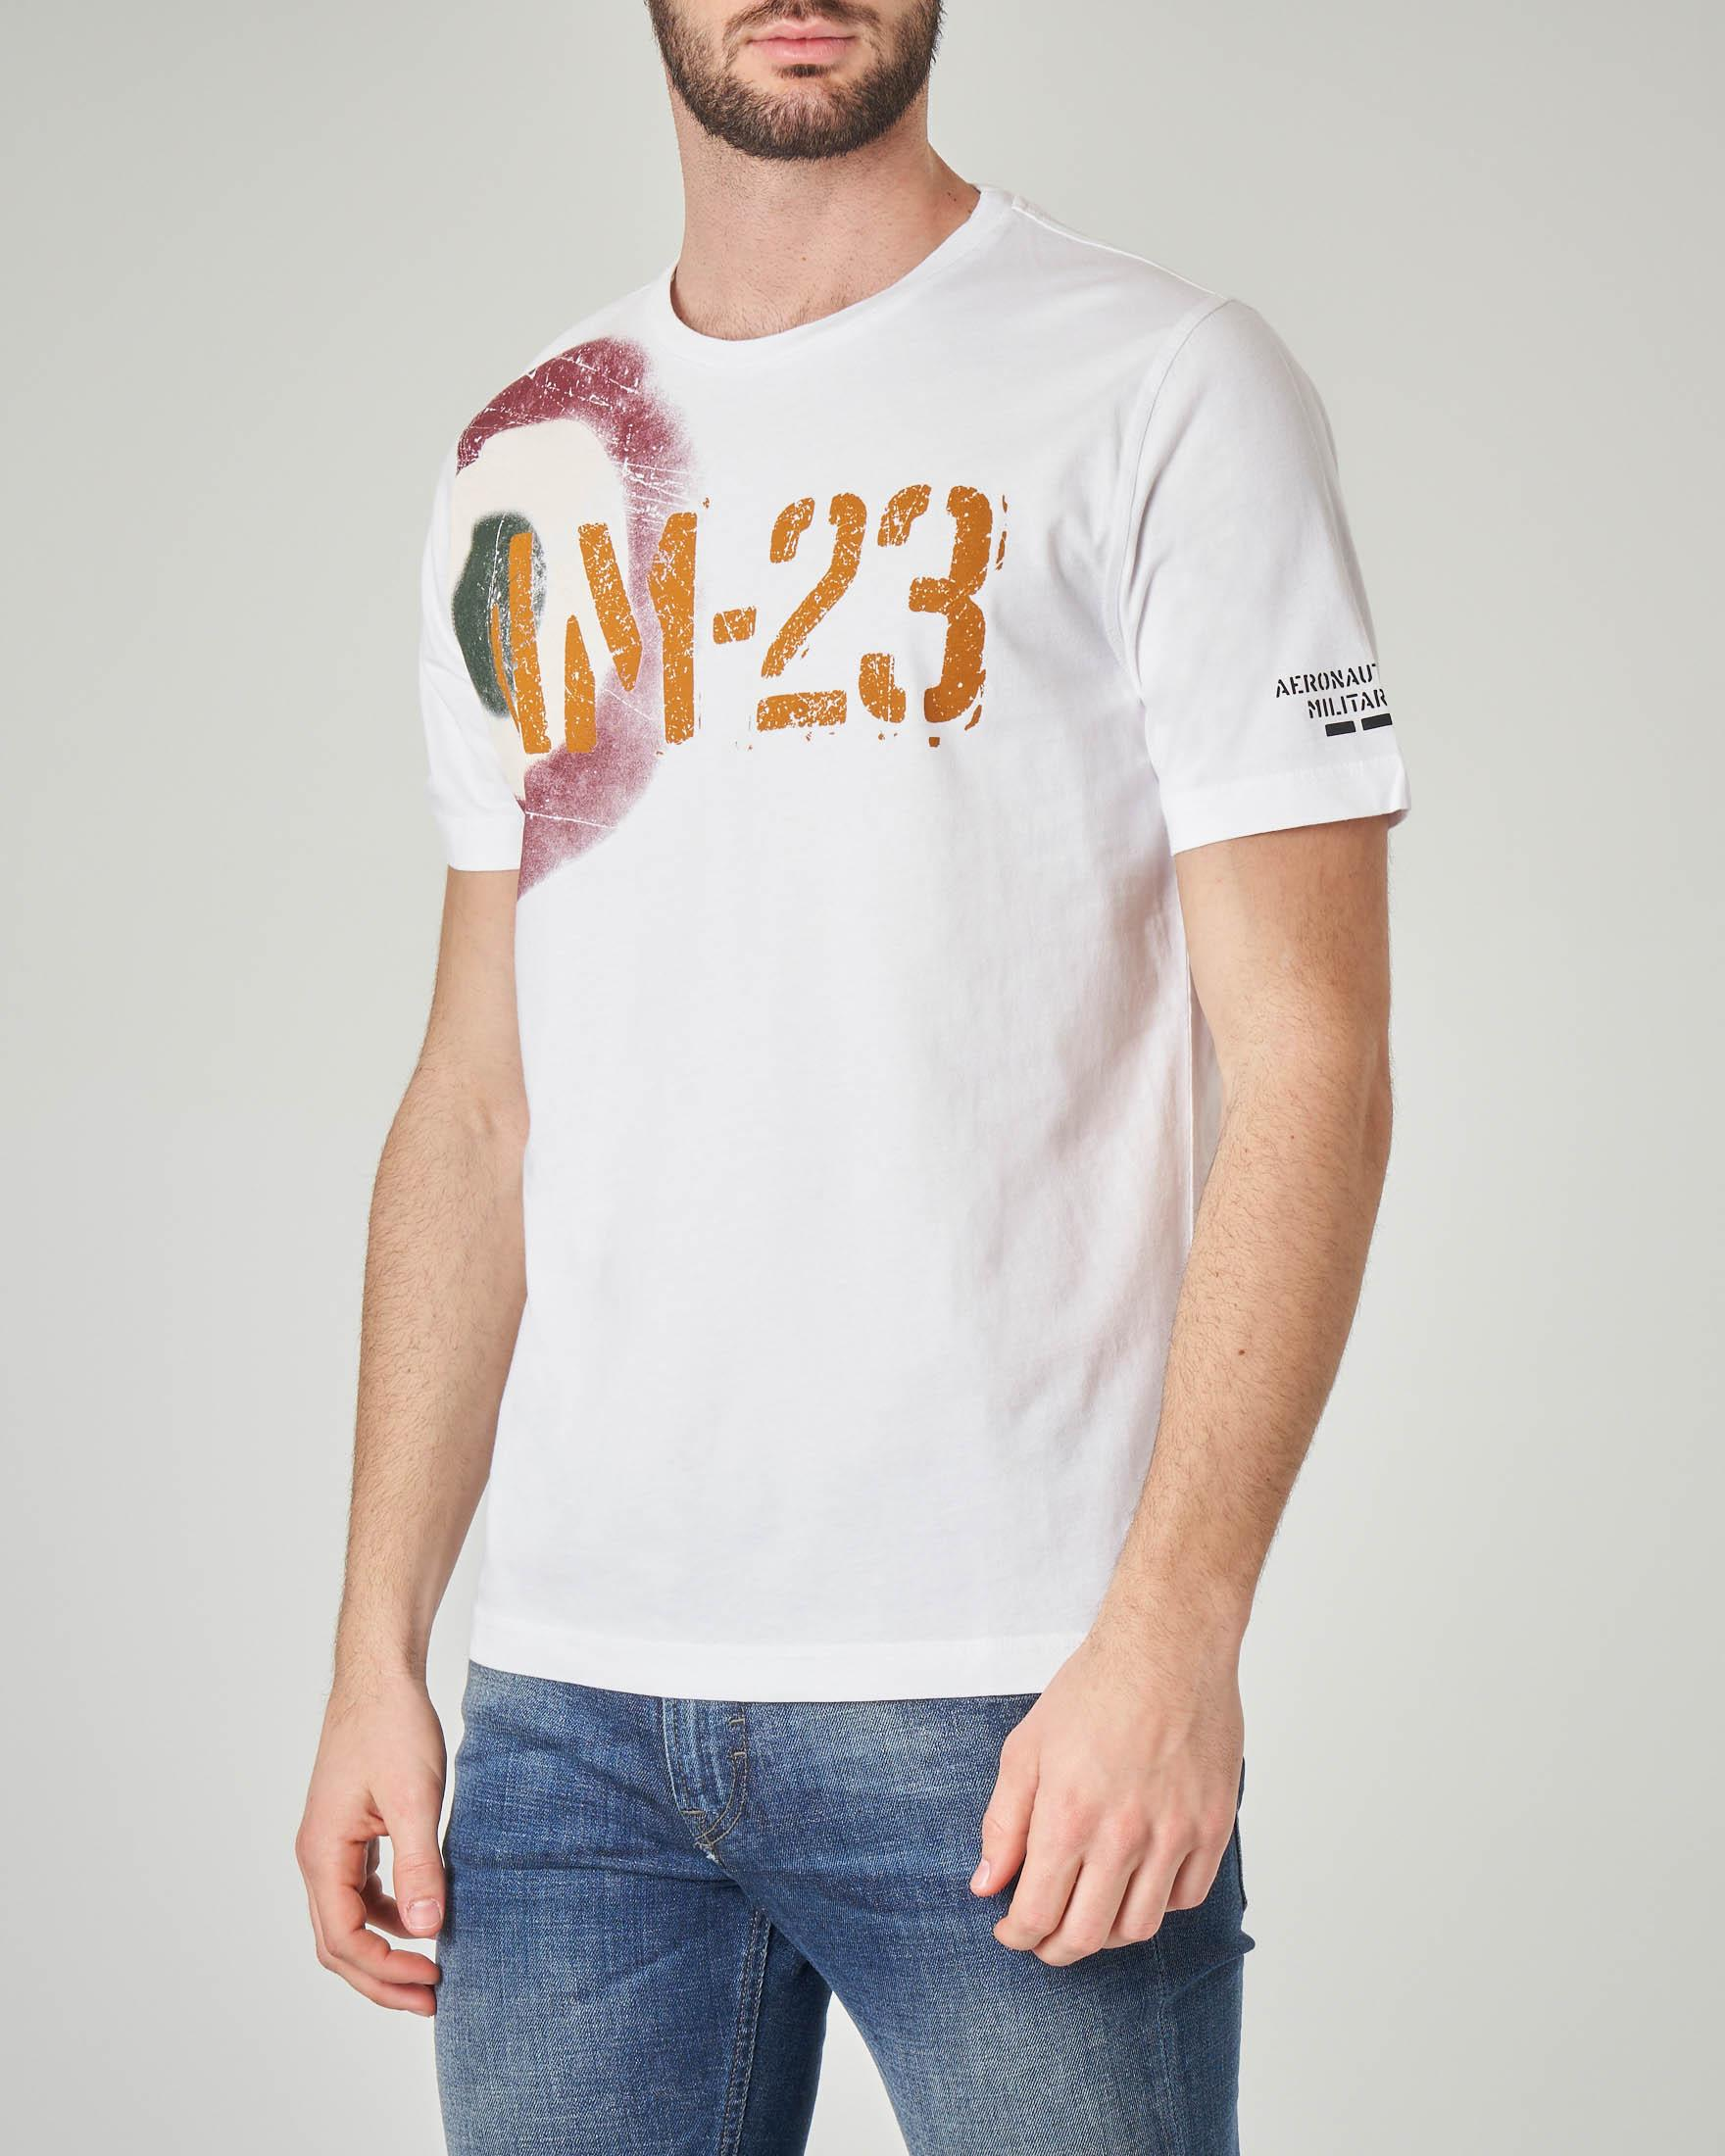 T-shirt bianca con stampa coccarda